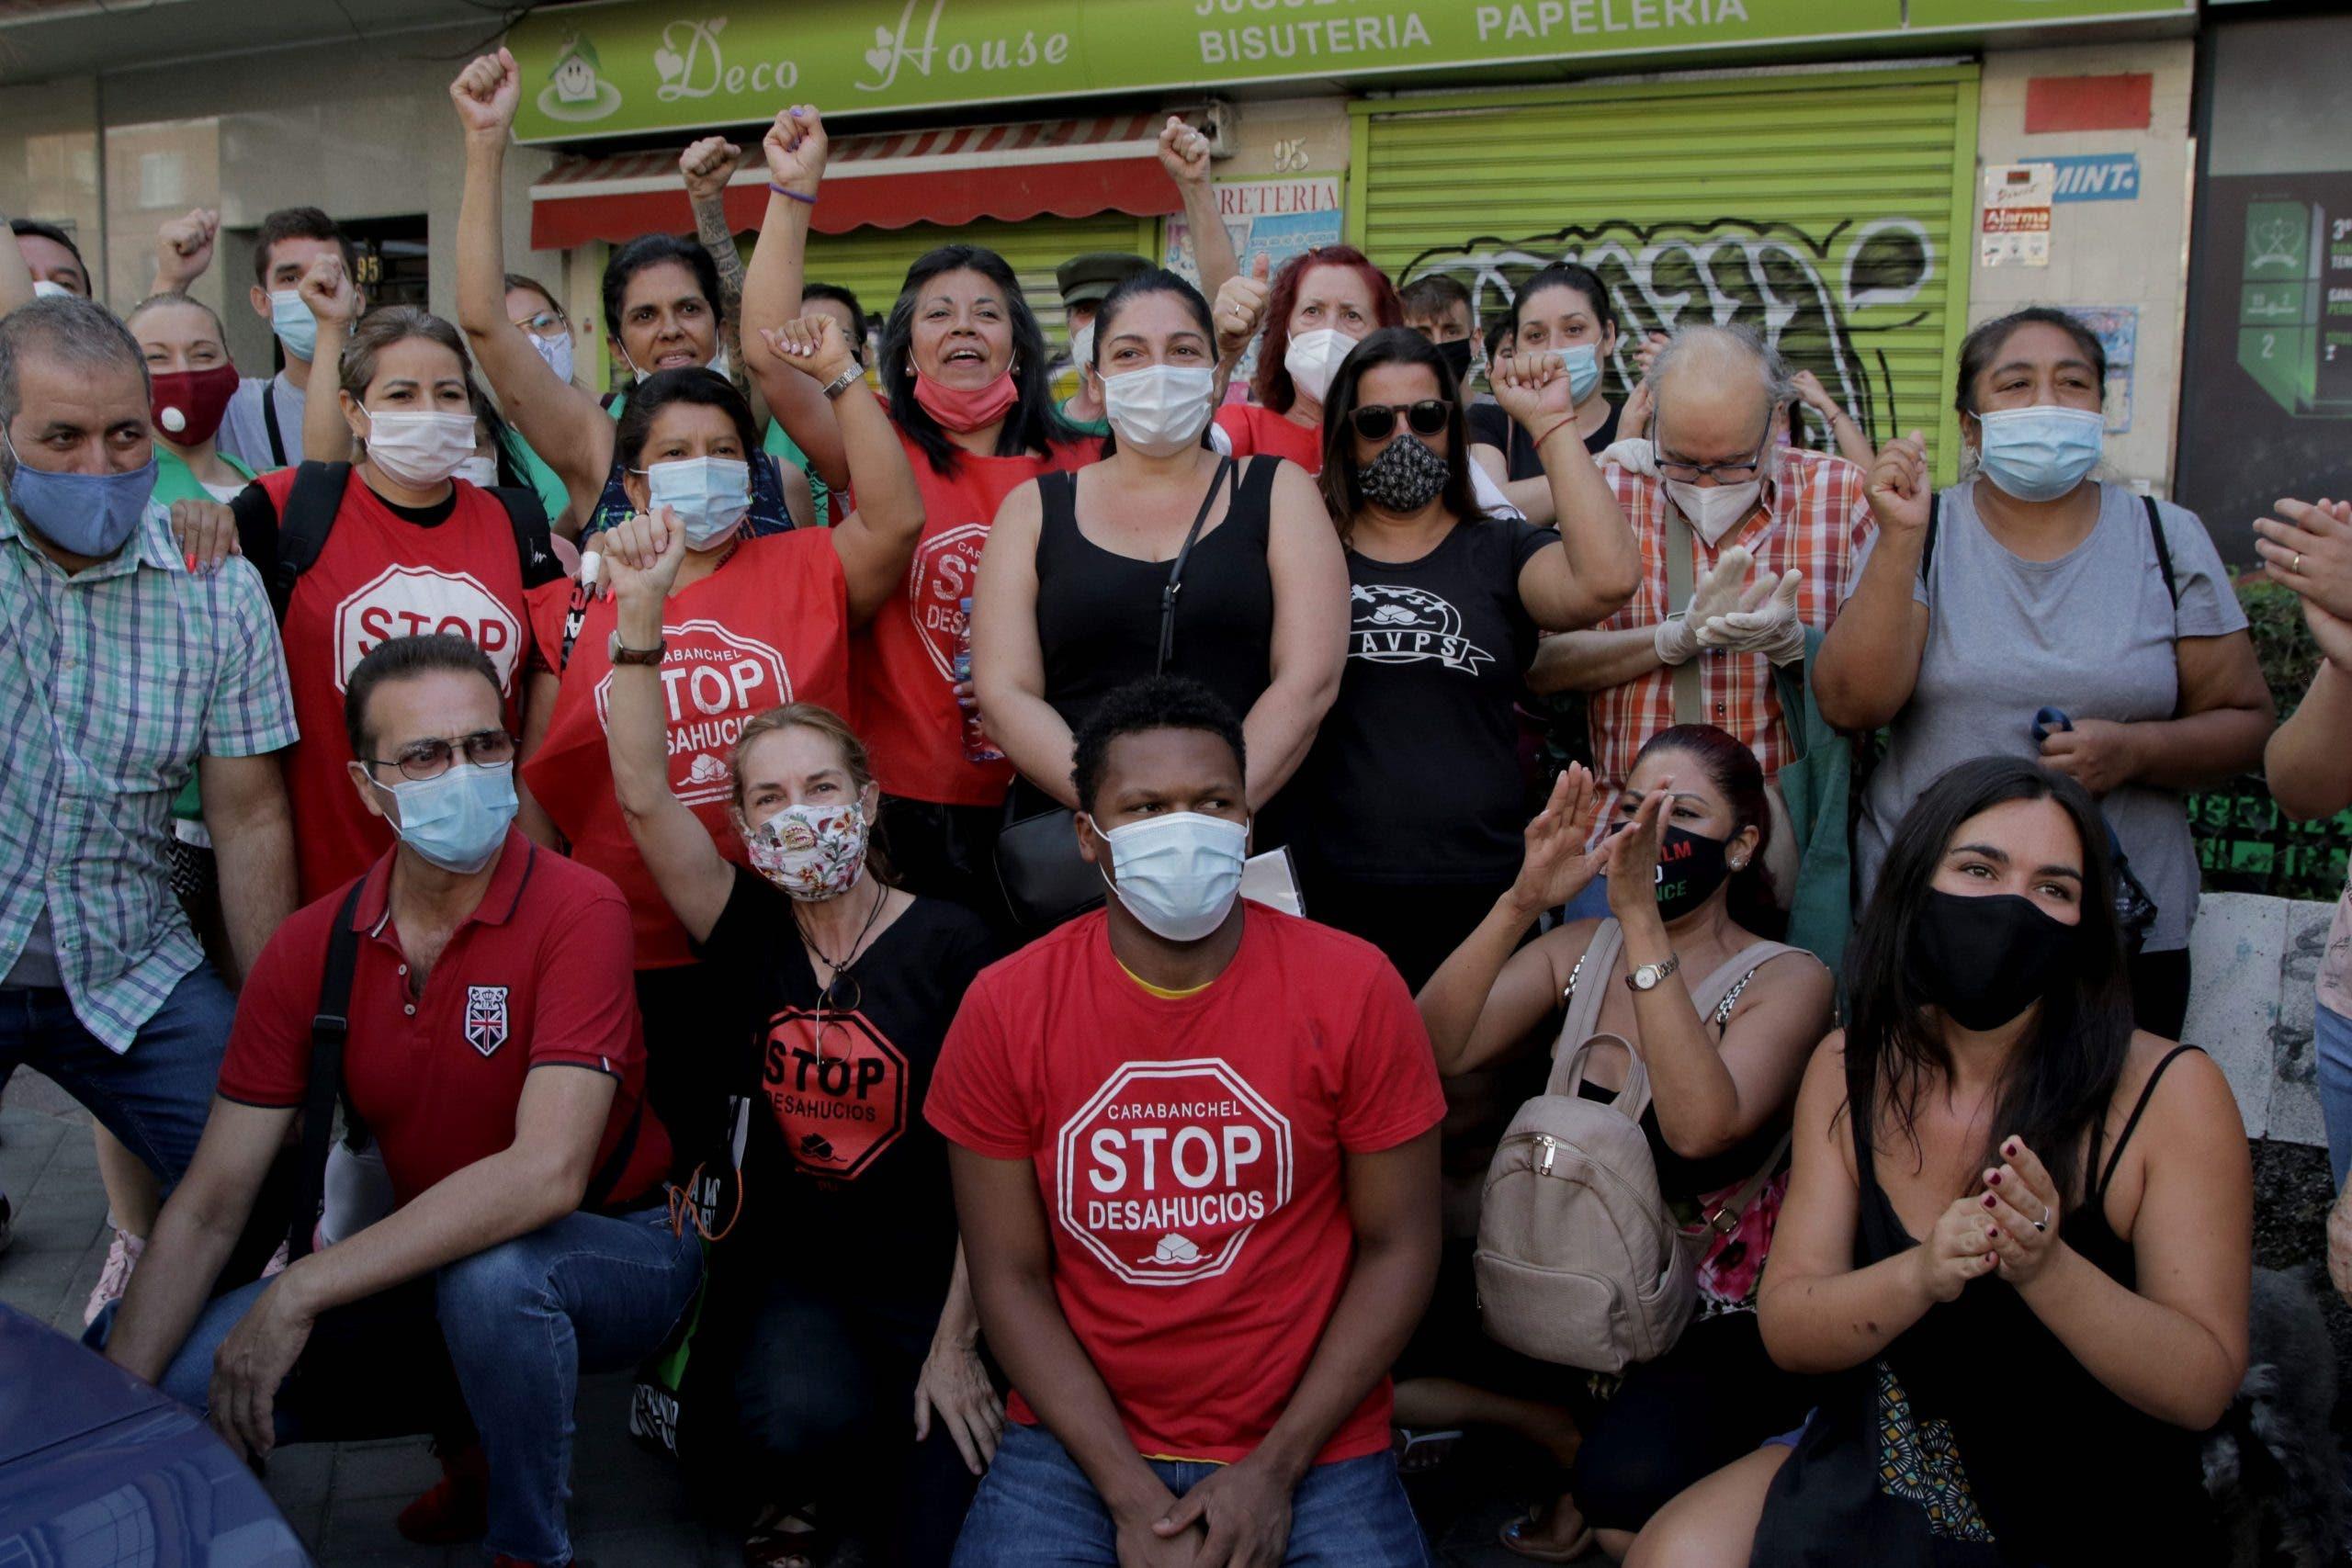 A recent protest by the Stop Desahucios anti-eviction platform